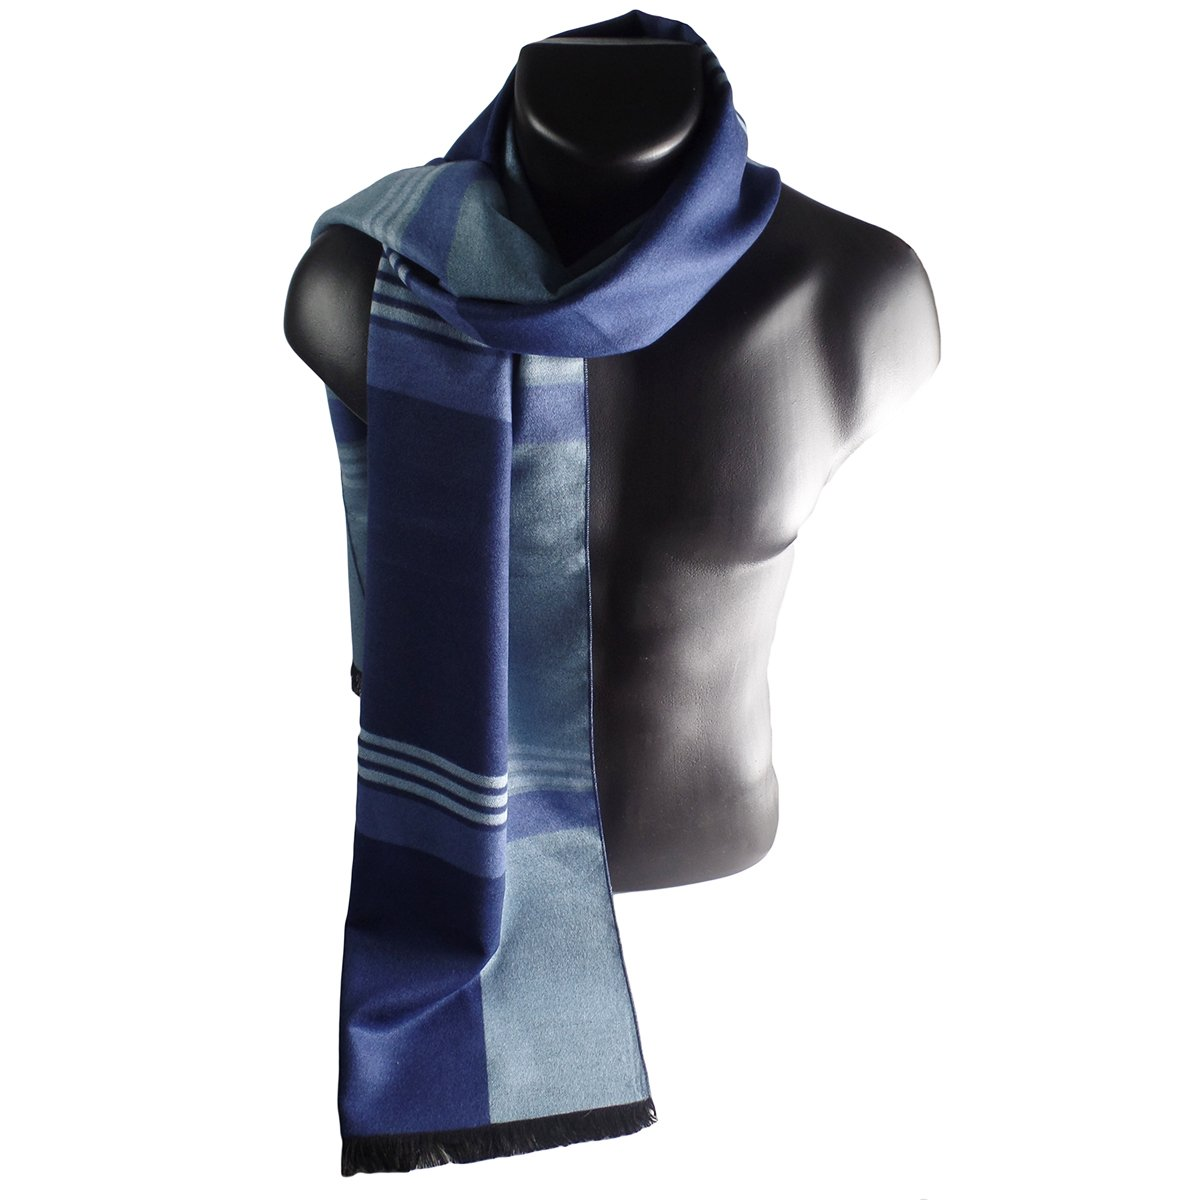 Mens Elegant Fashion Winter Scarves (Blue)